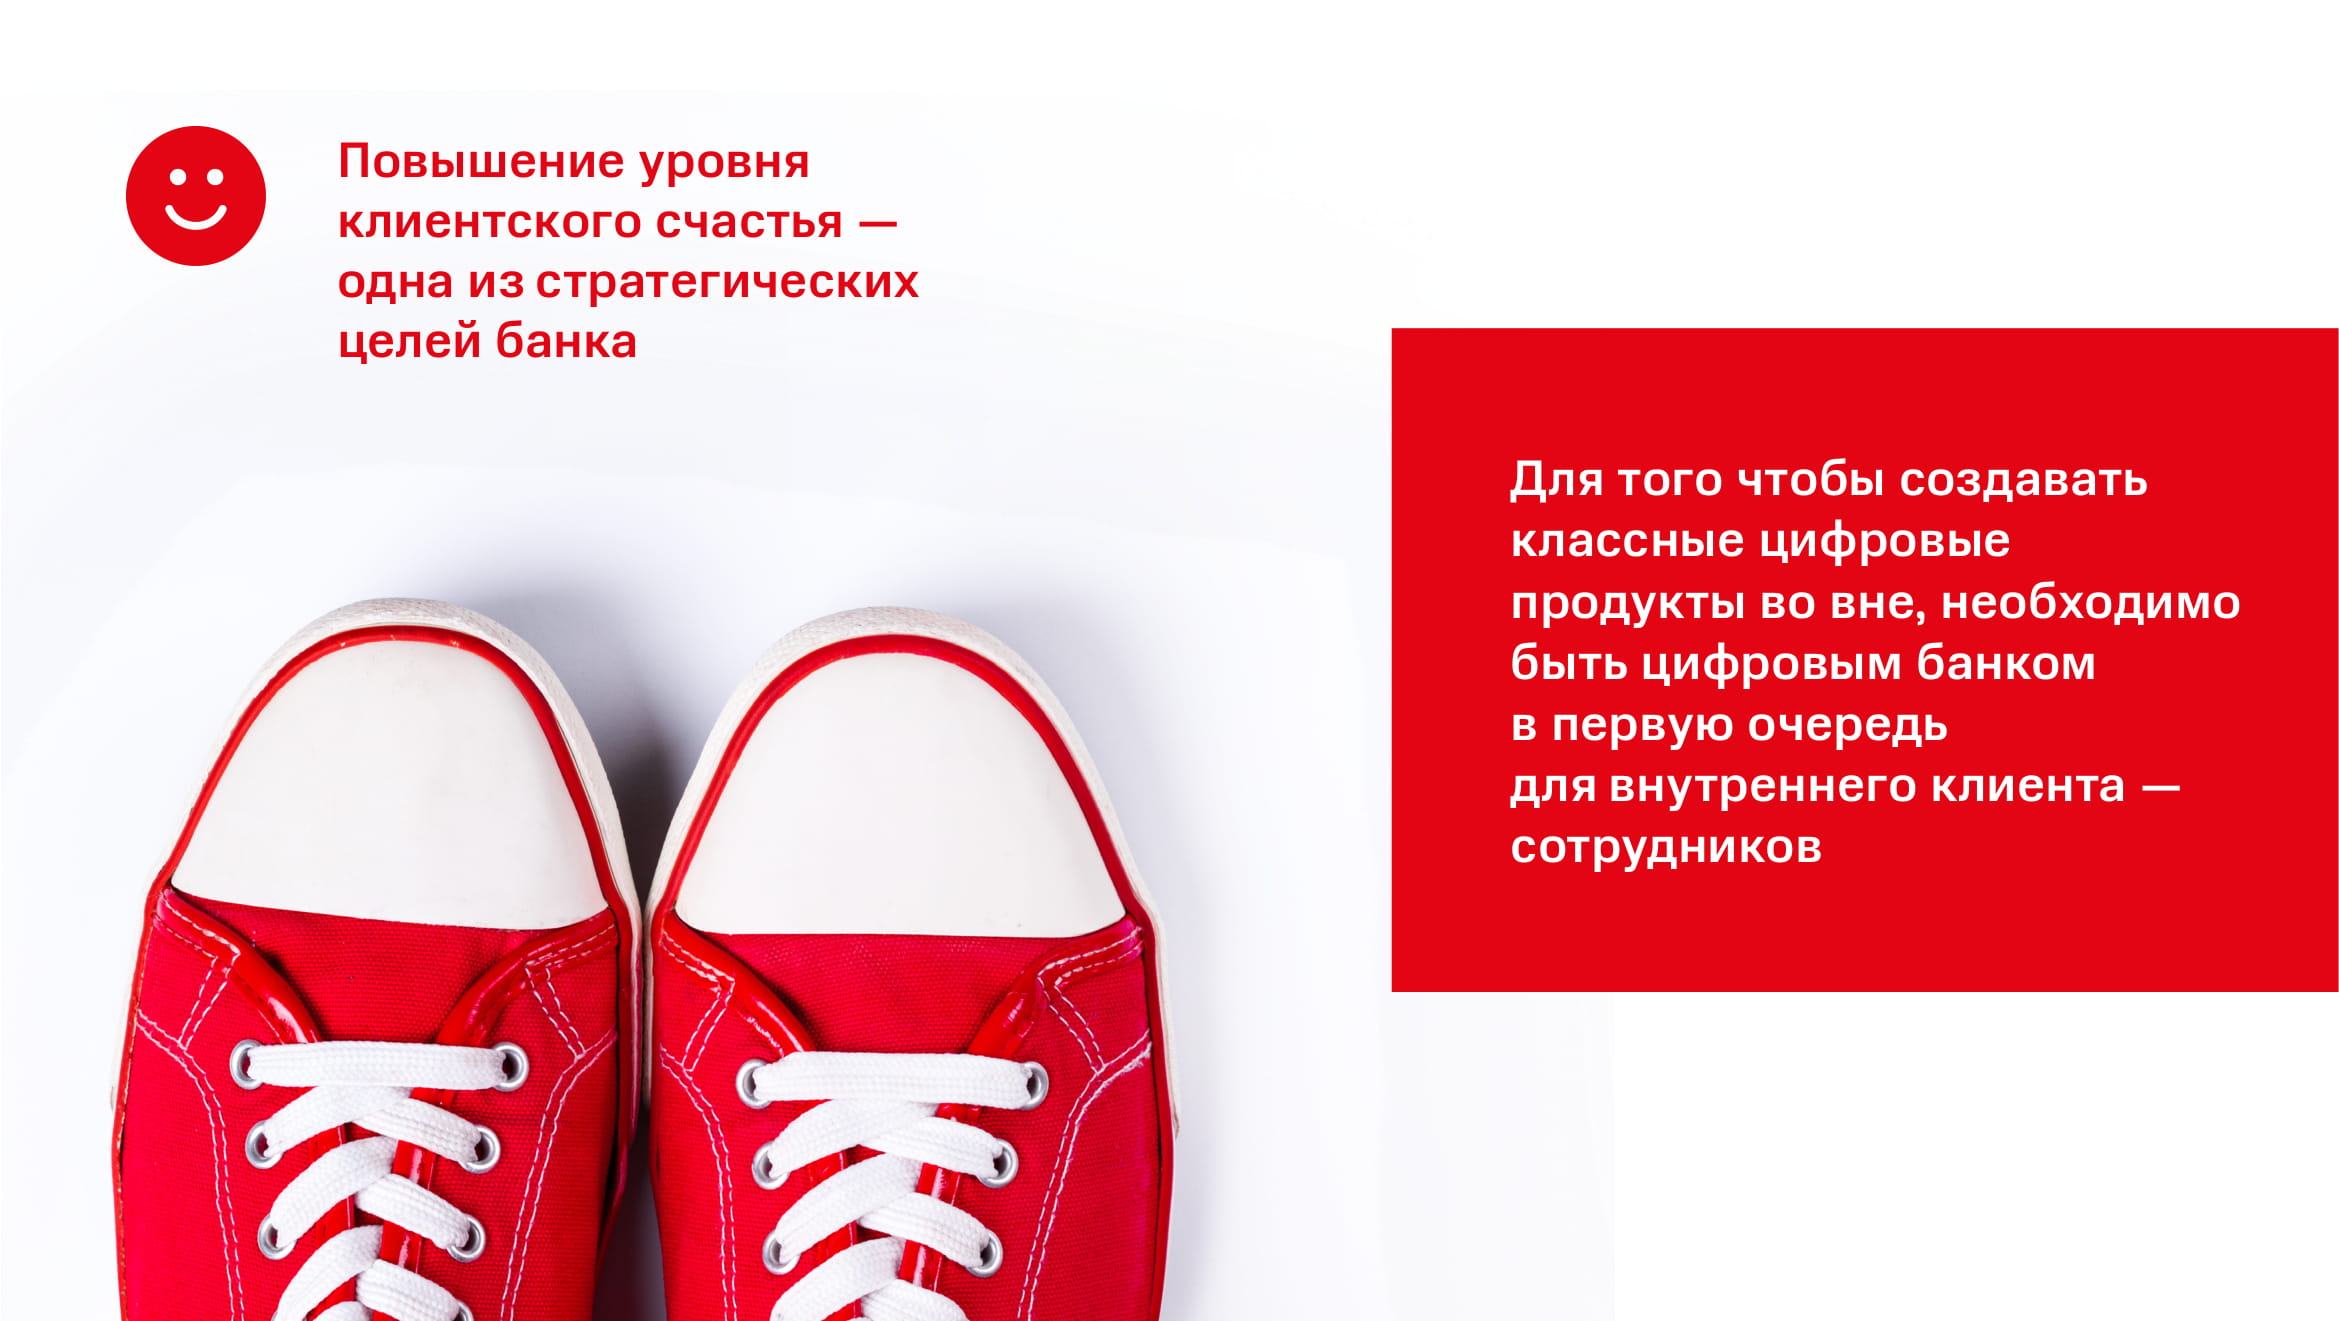 RFA_Креатив-года-2020_МТС-Банк-VS-Альфа-Банк-12